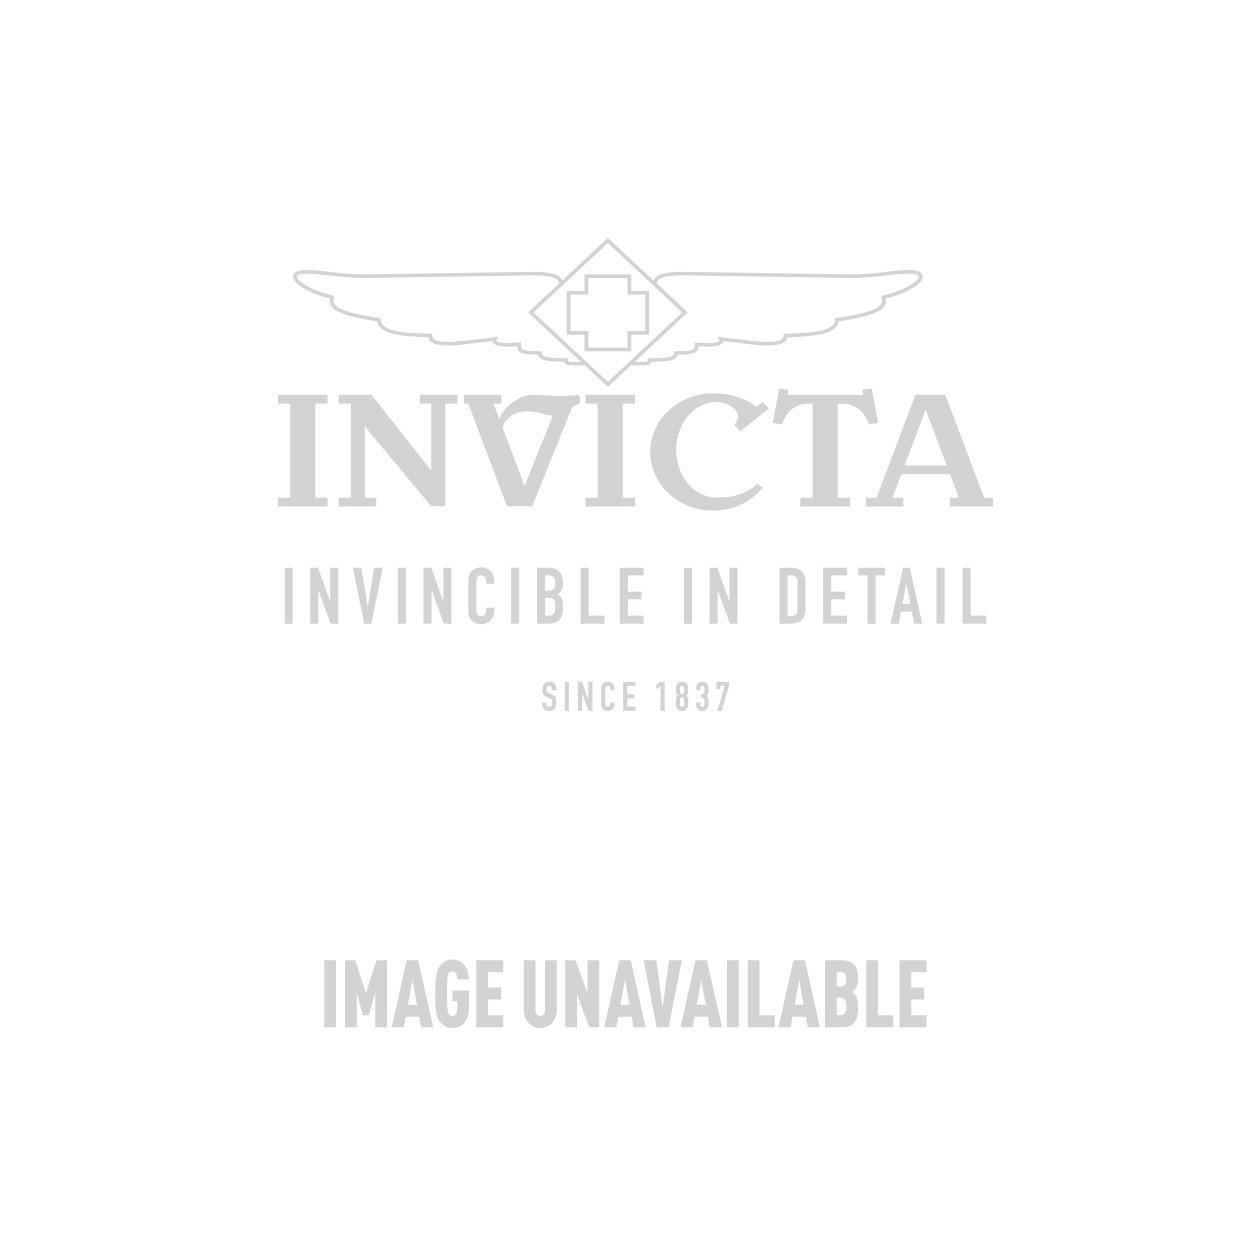 2fe60f15e Invicta Pro Diver SCUBA Mens Quartz 50mm Gold Case Blue Dial - Model 22798  - Official Invicta Store